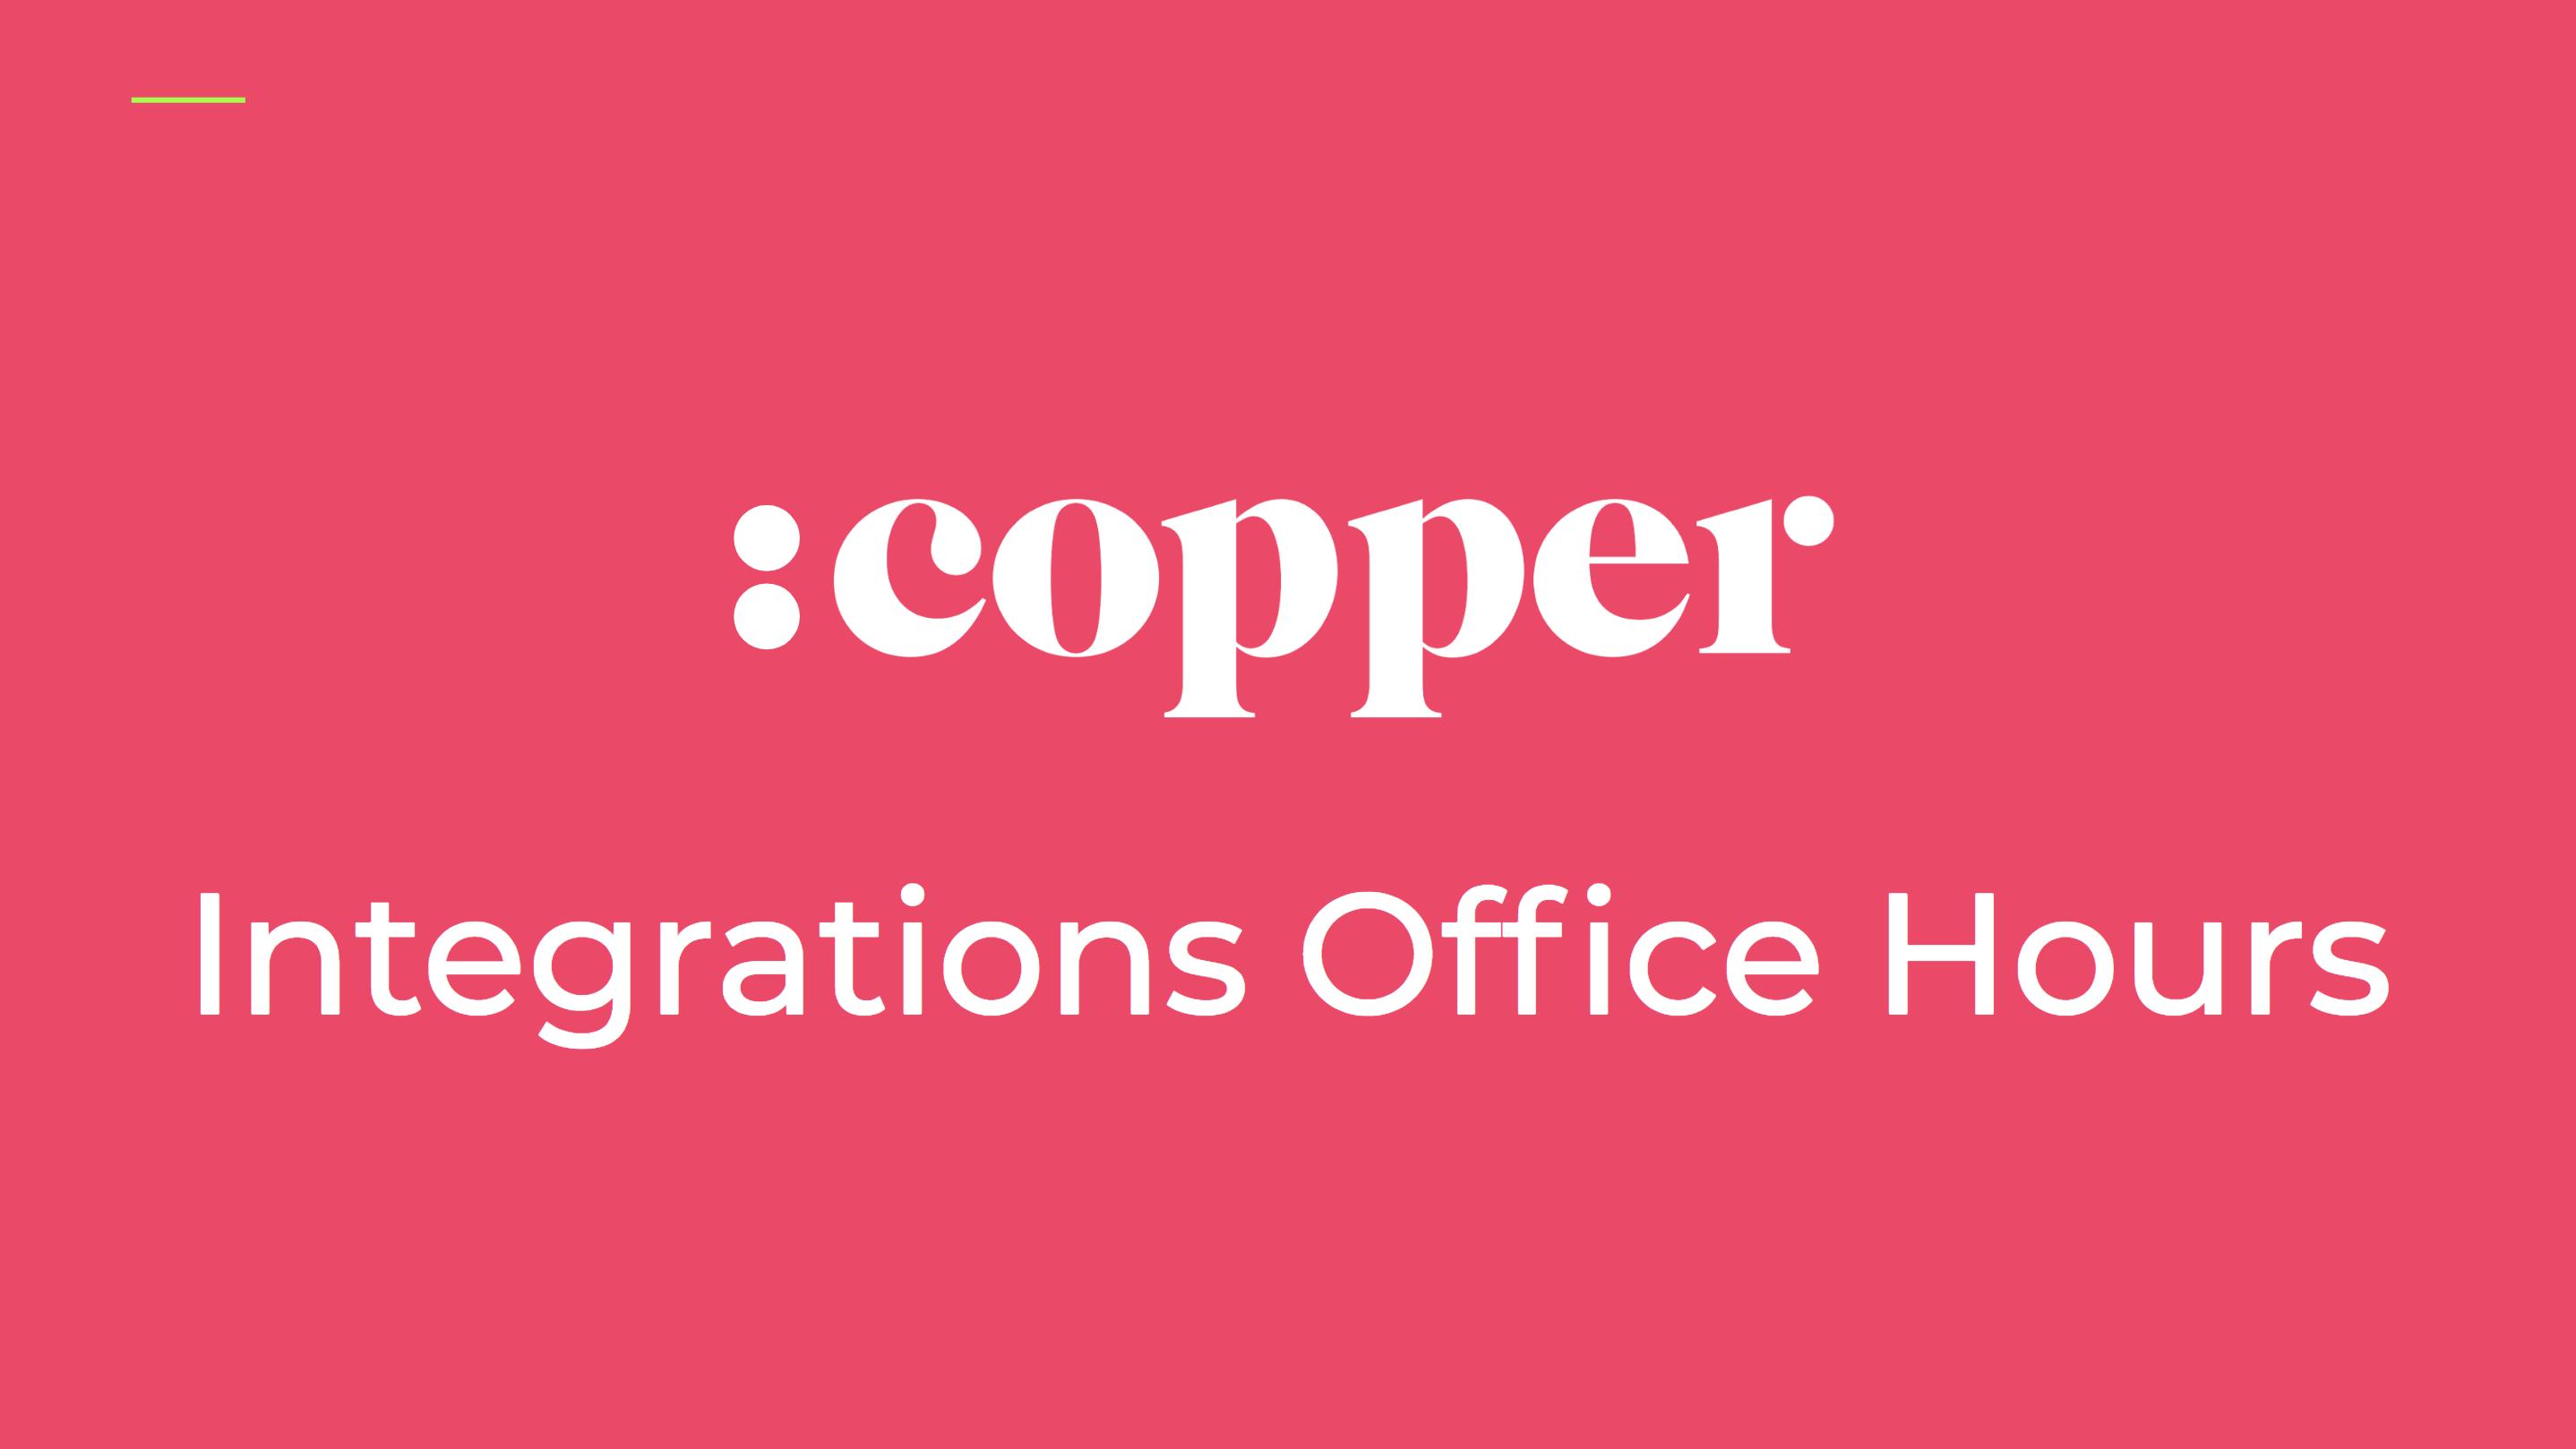 LIVE Office Hours: Copper Integrations - Thursdays